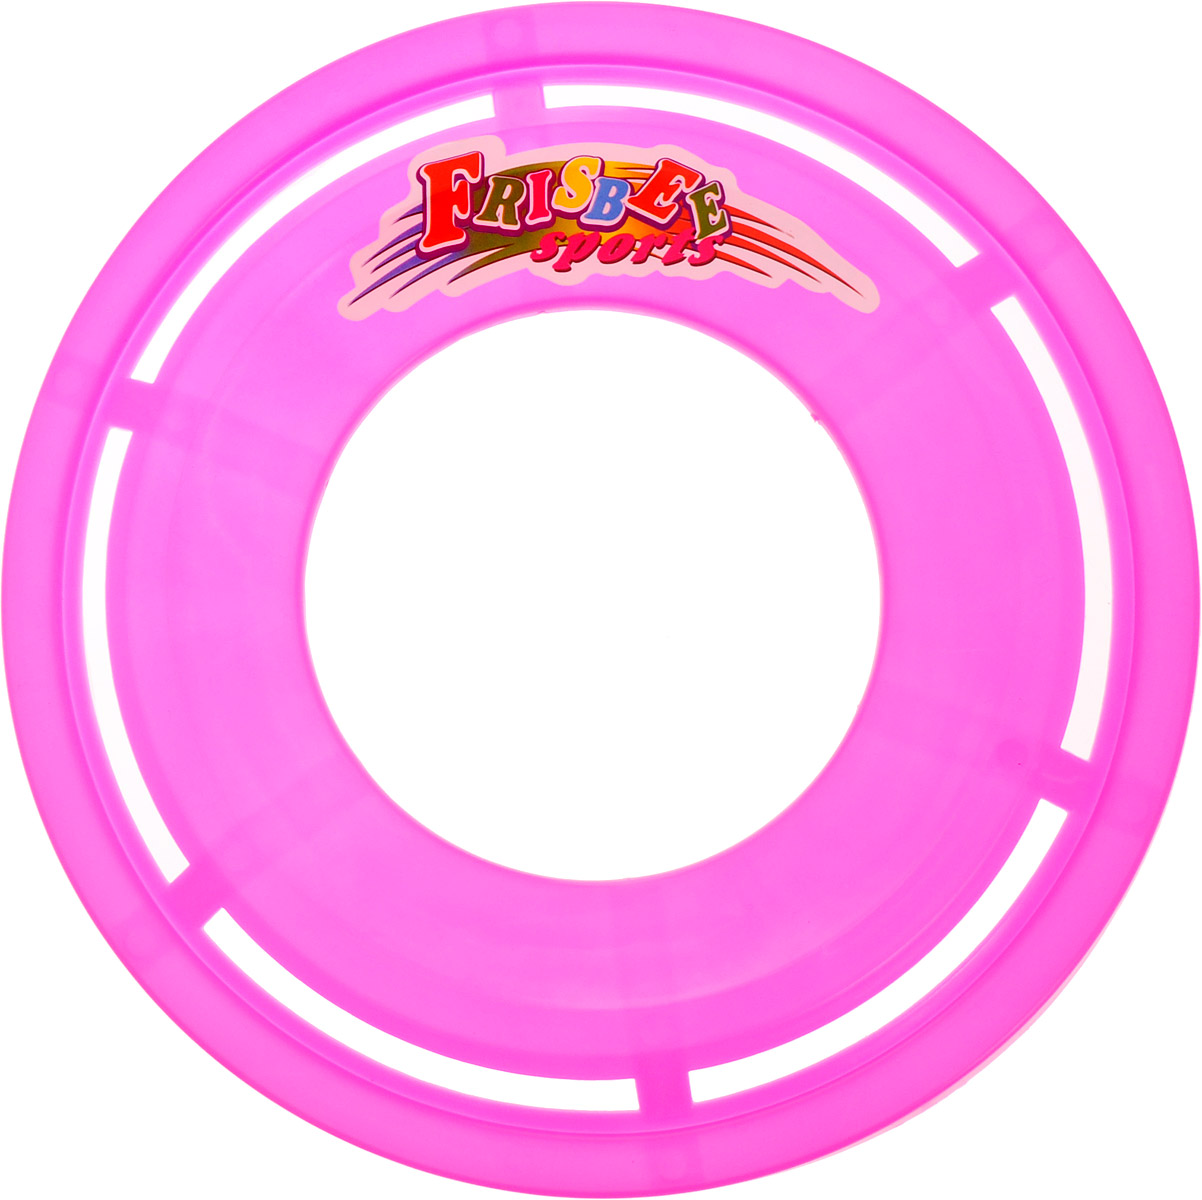 Veld-Co Летающая тарелка цвет розовый диаметр 23 см степлеры канцелярские veld co степлер